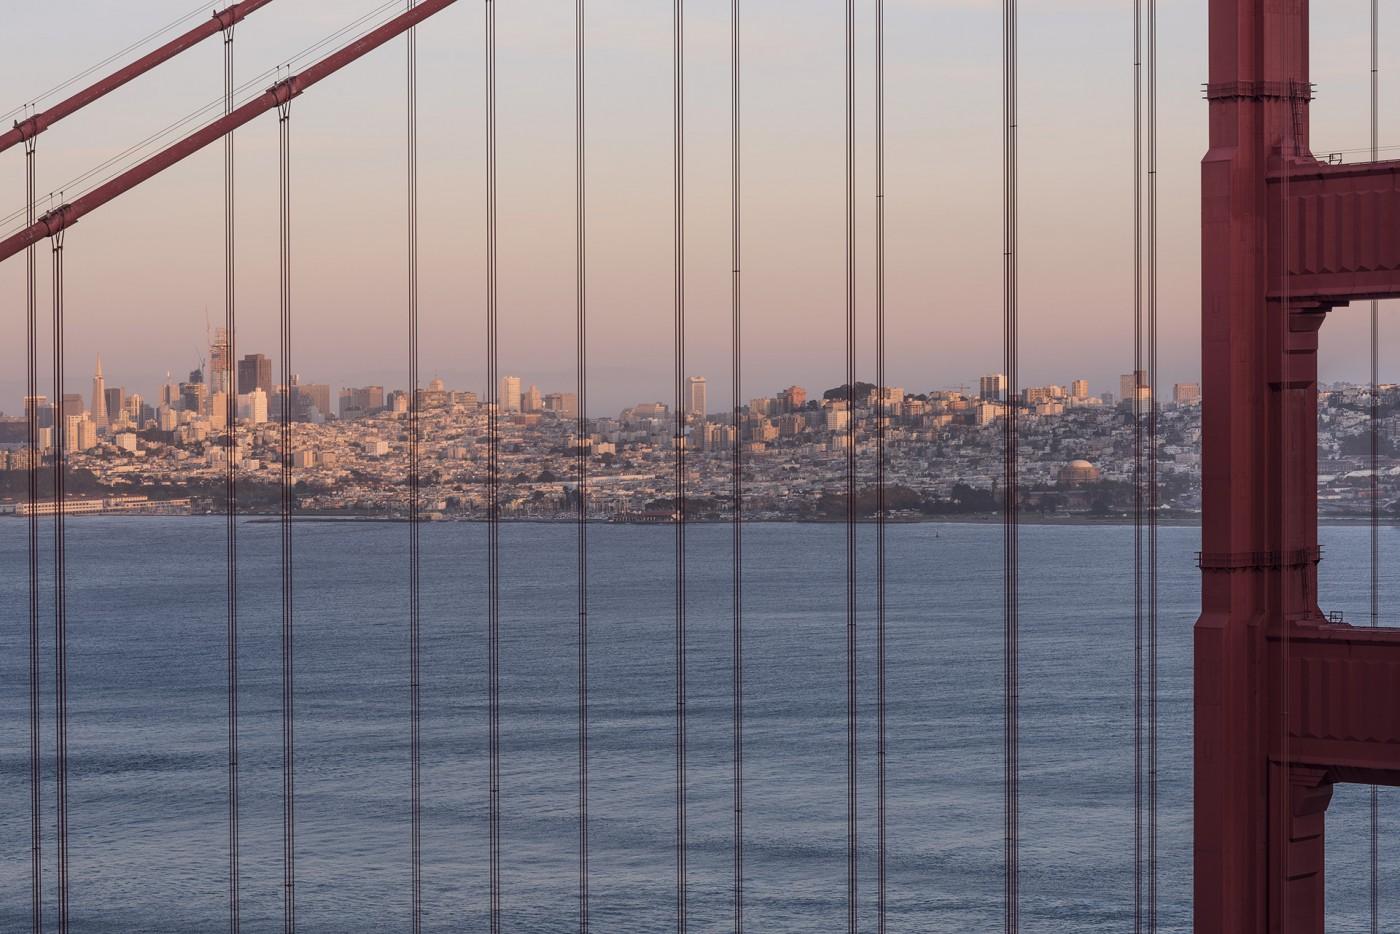 SF Lines